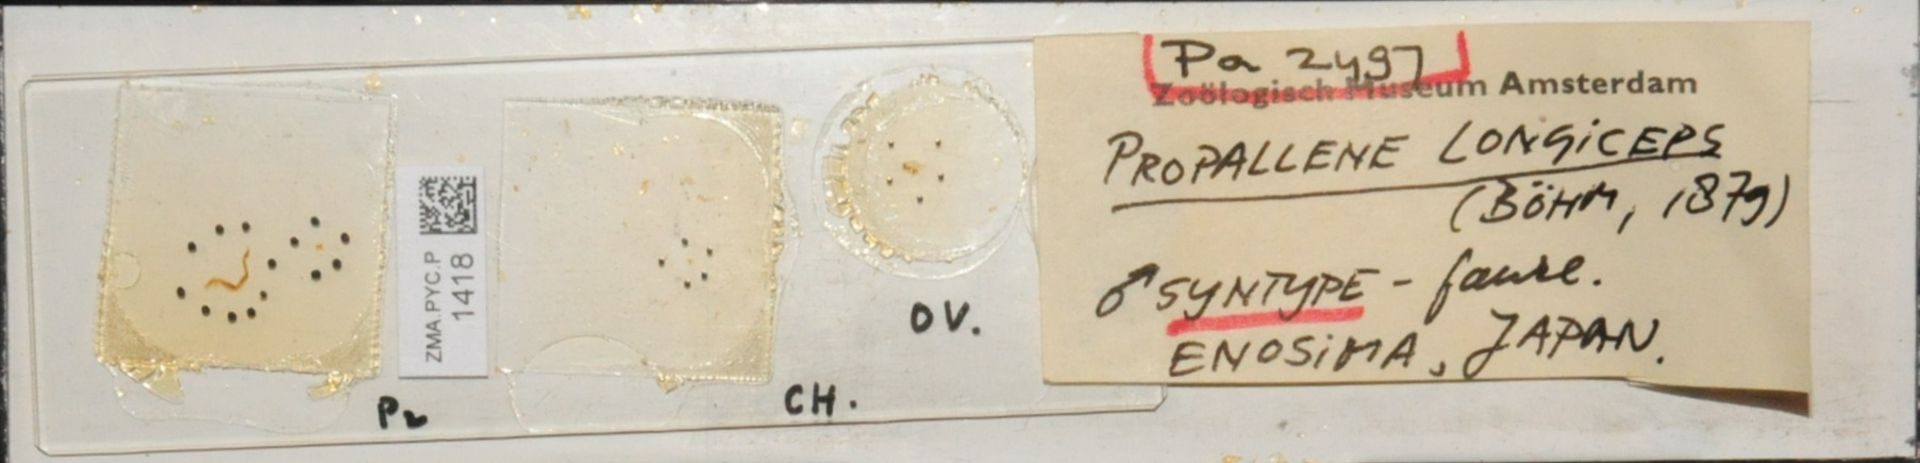 ZMA.PYC.P.1418   Propallene longiceps (Böhm, 1879)